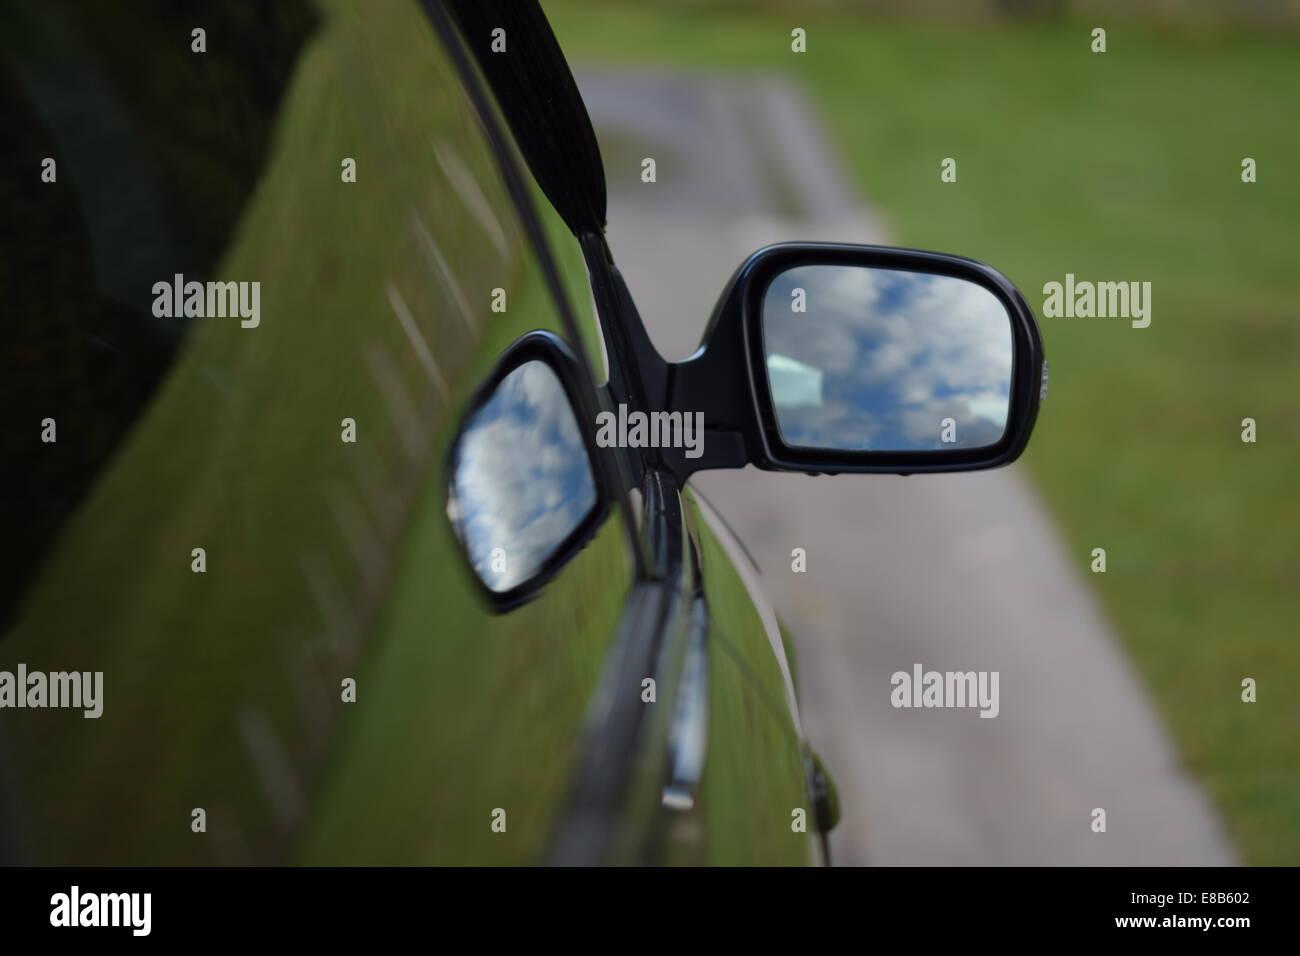 Car Wing Mirror - Stock Image